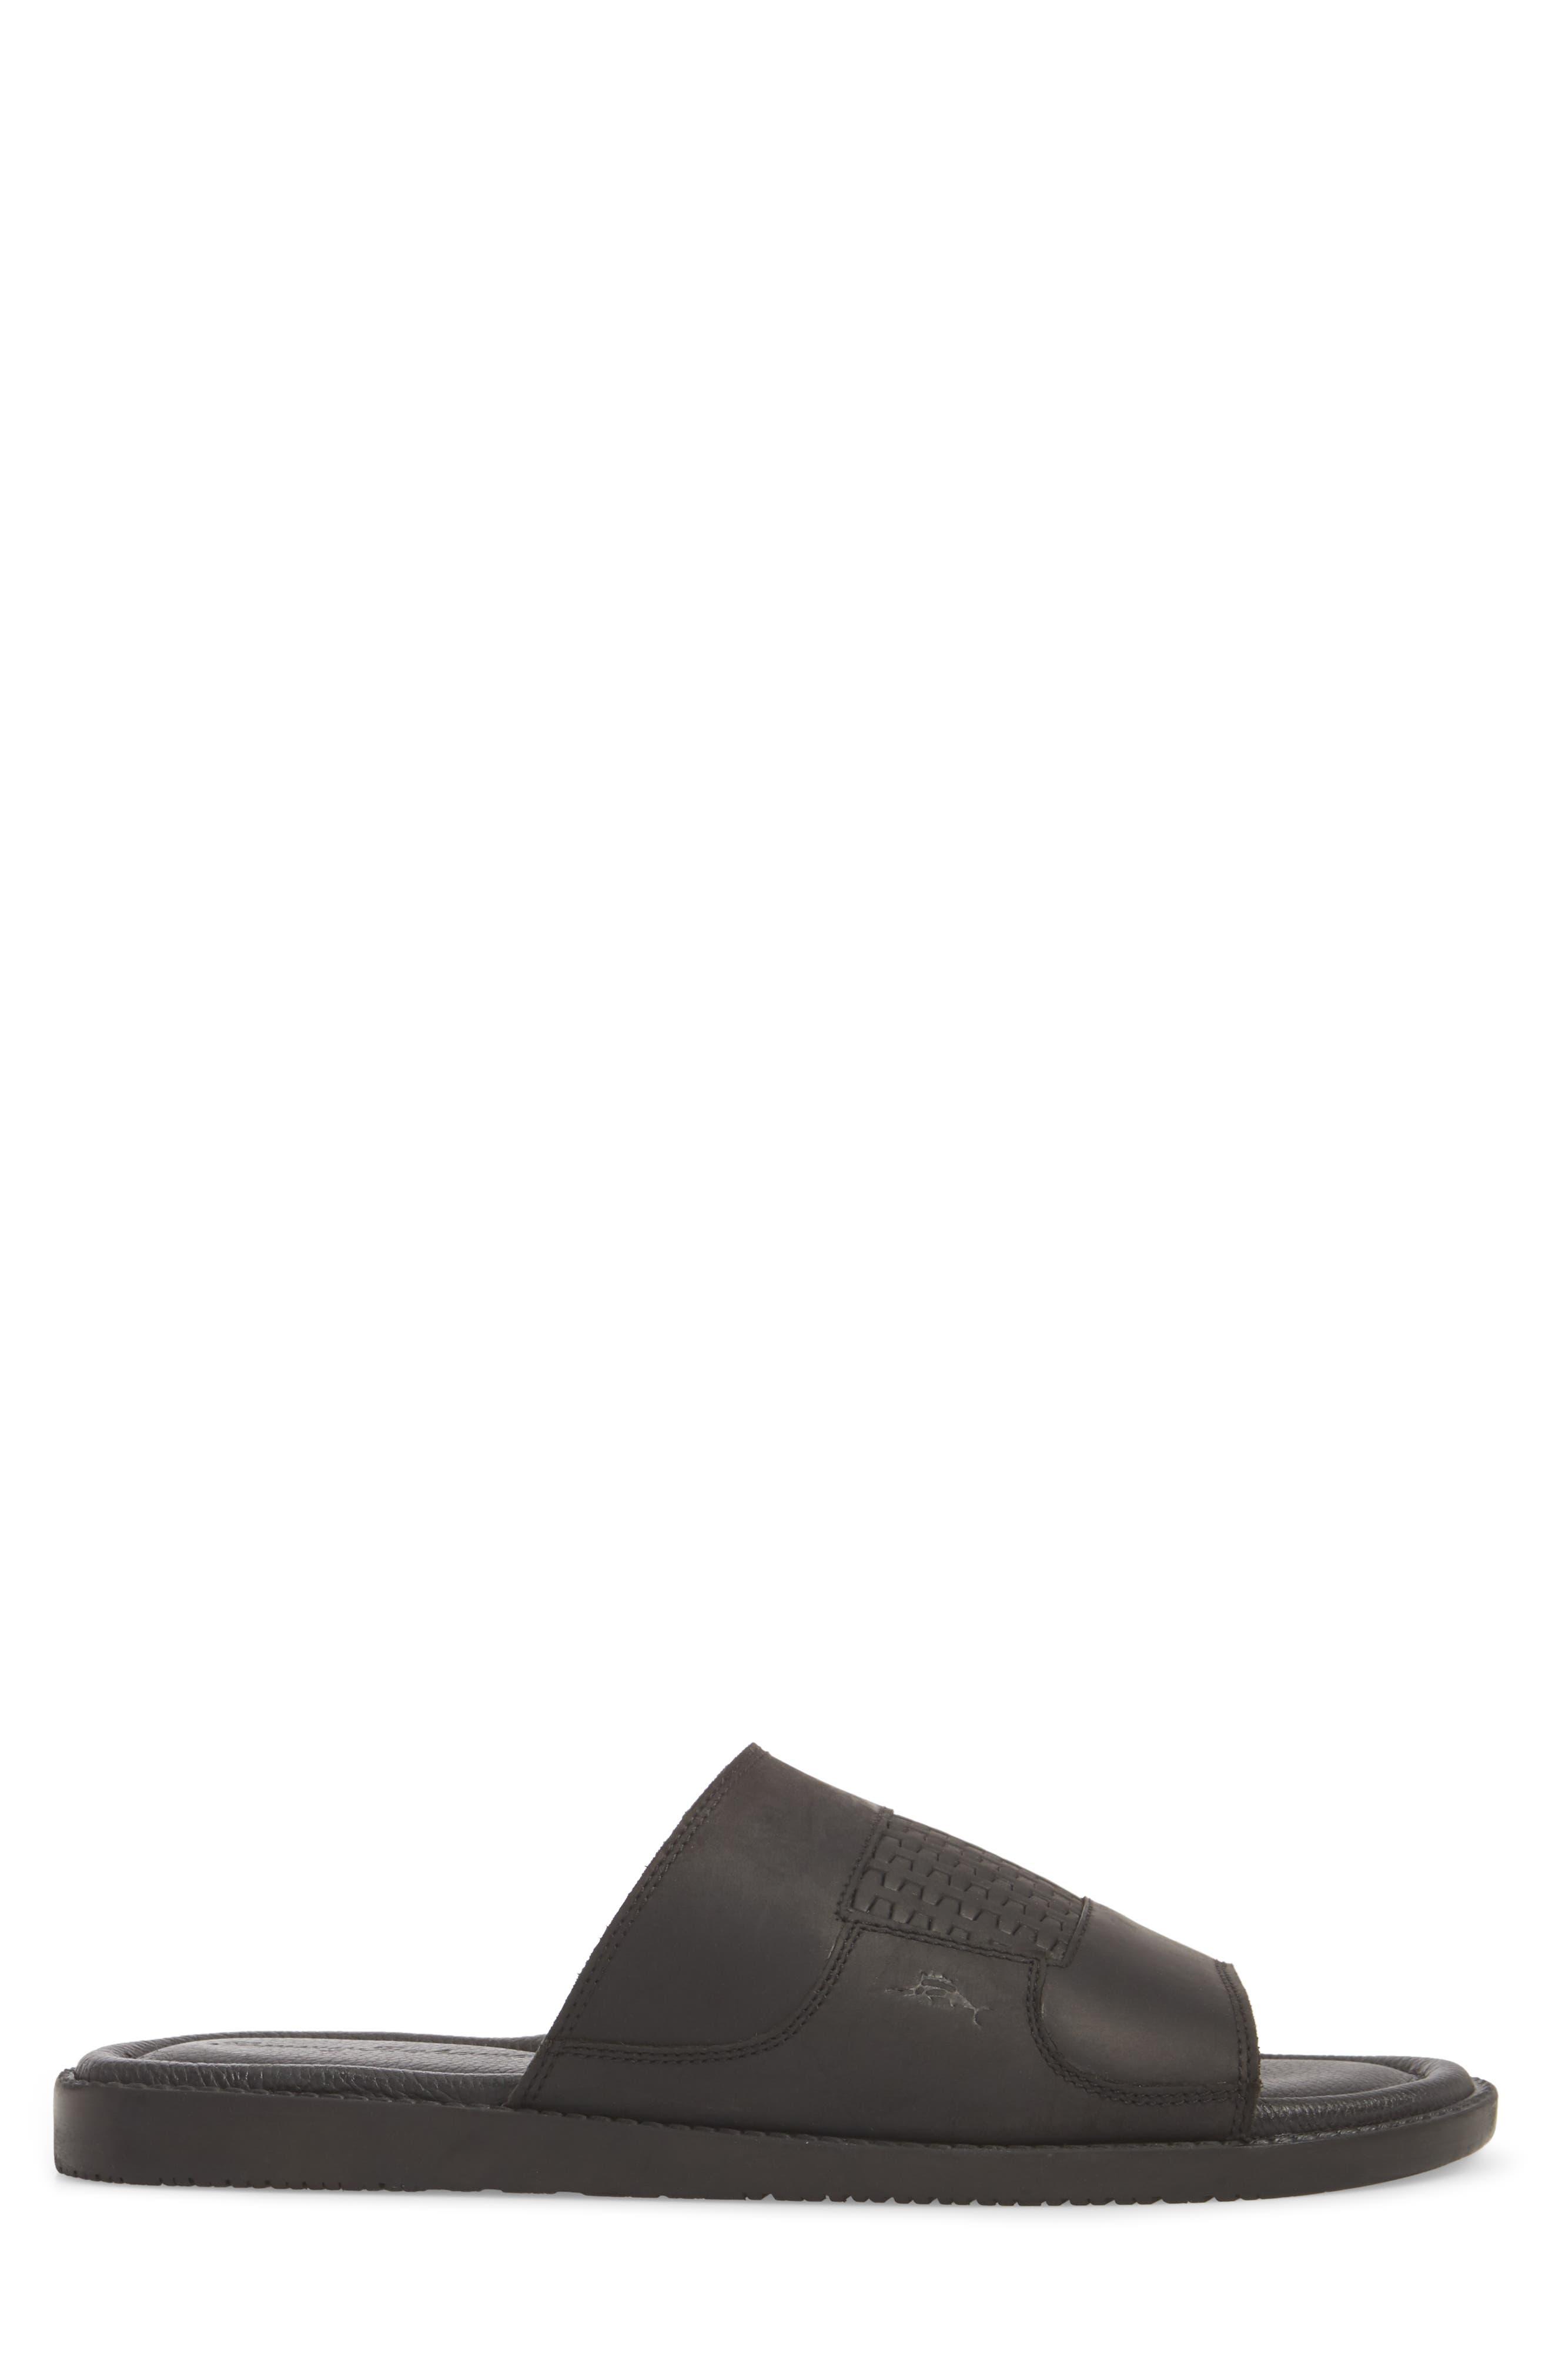 Gennadi Palms Slide Sandal,                             Alternate thumbnail 3, color,                             BLACK LEATHER